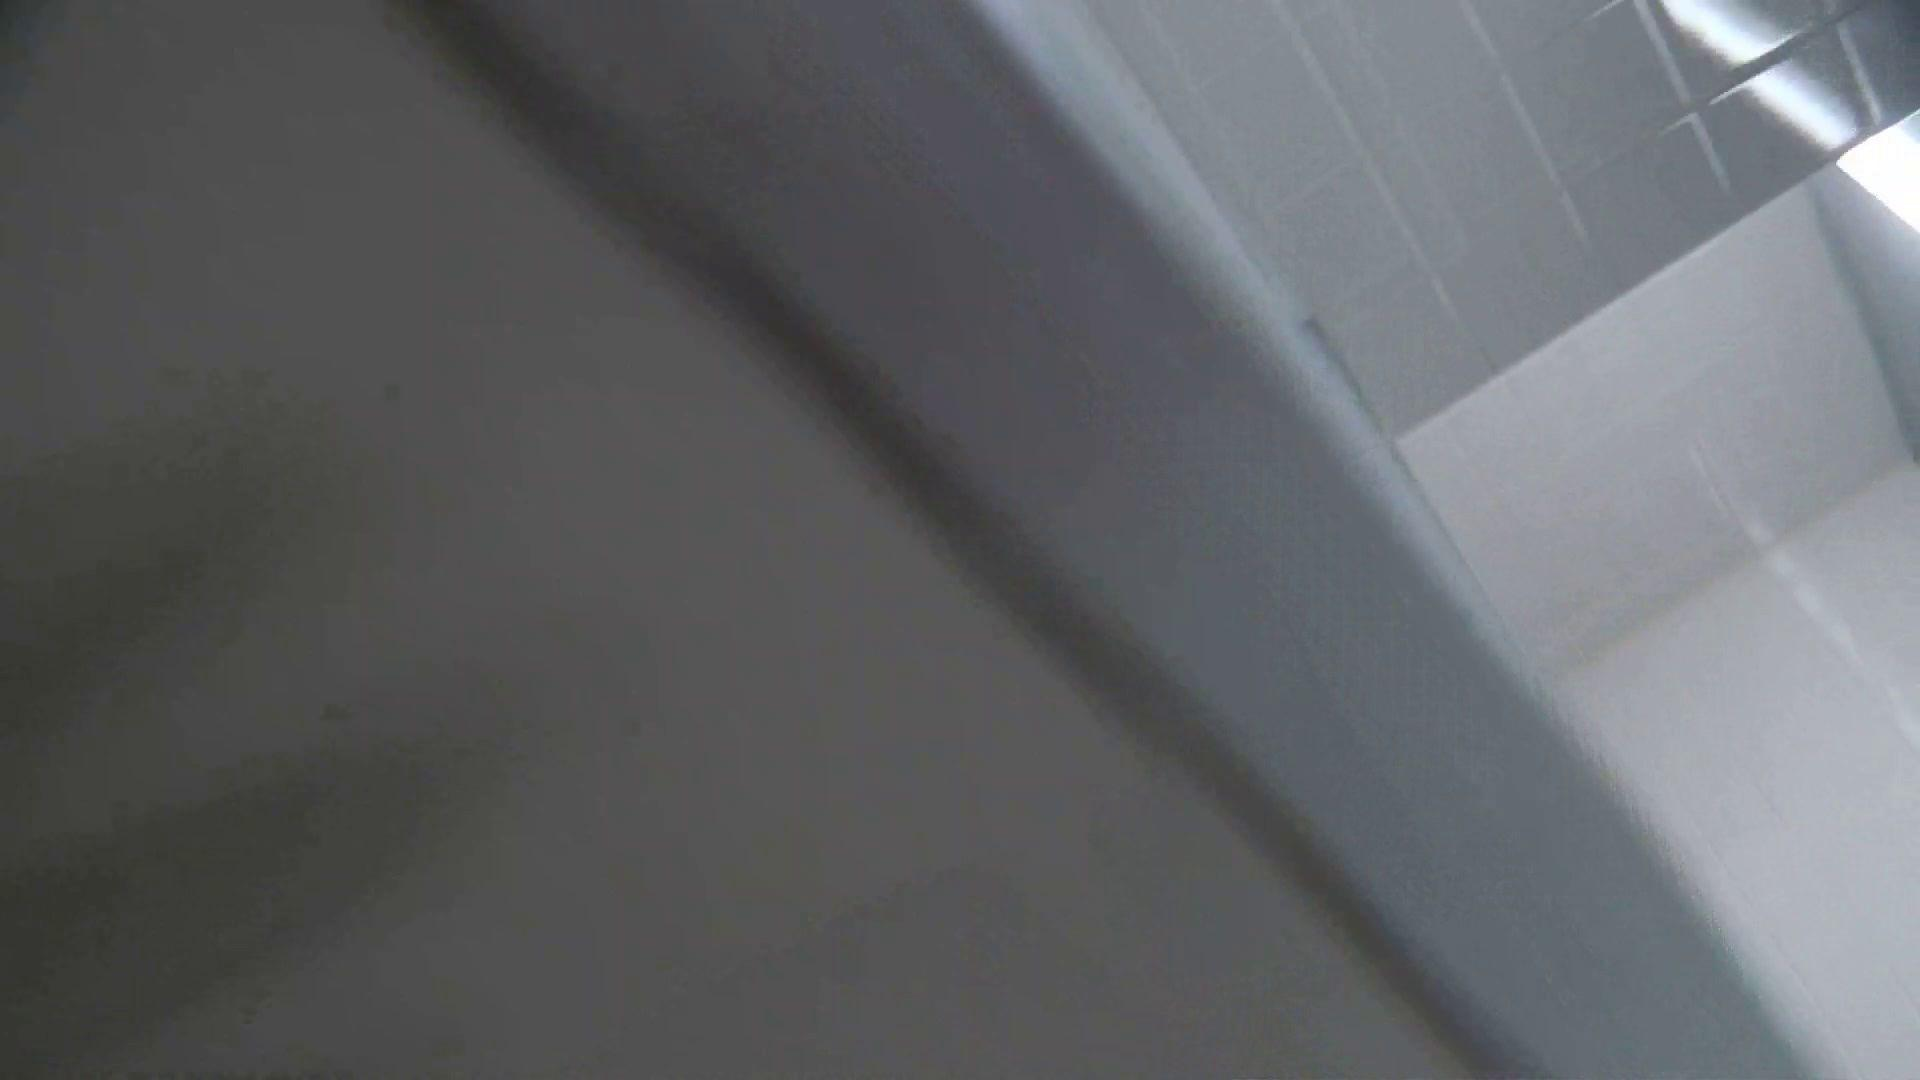 vol.09 命がけ潜伏洗面所! 残念!パンツについちゃいました。 OLヌード天国  103PIX 60